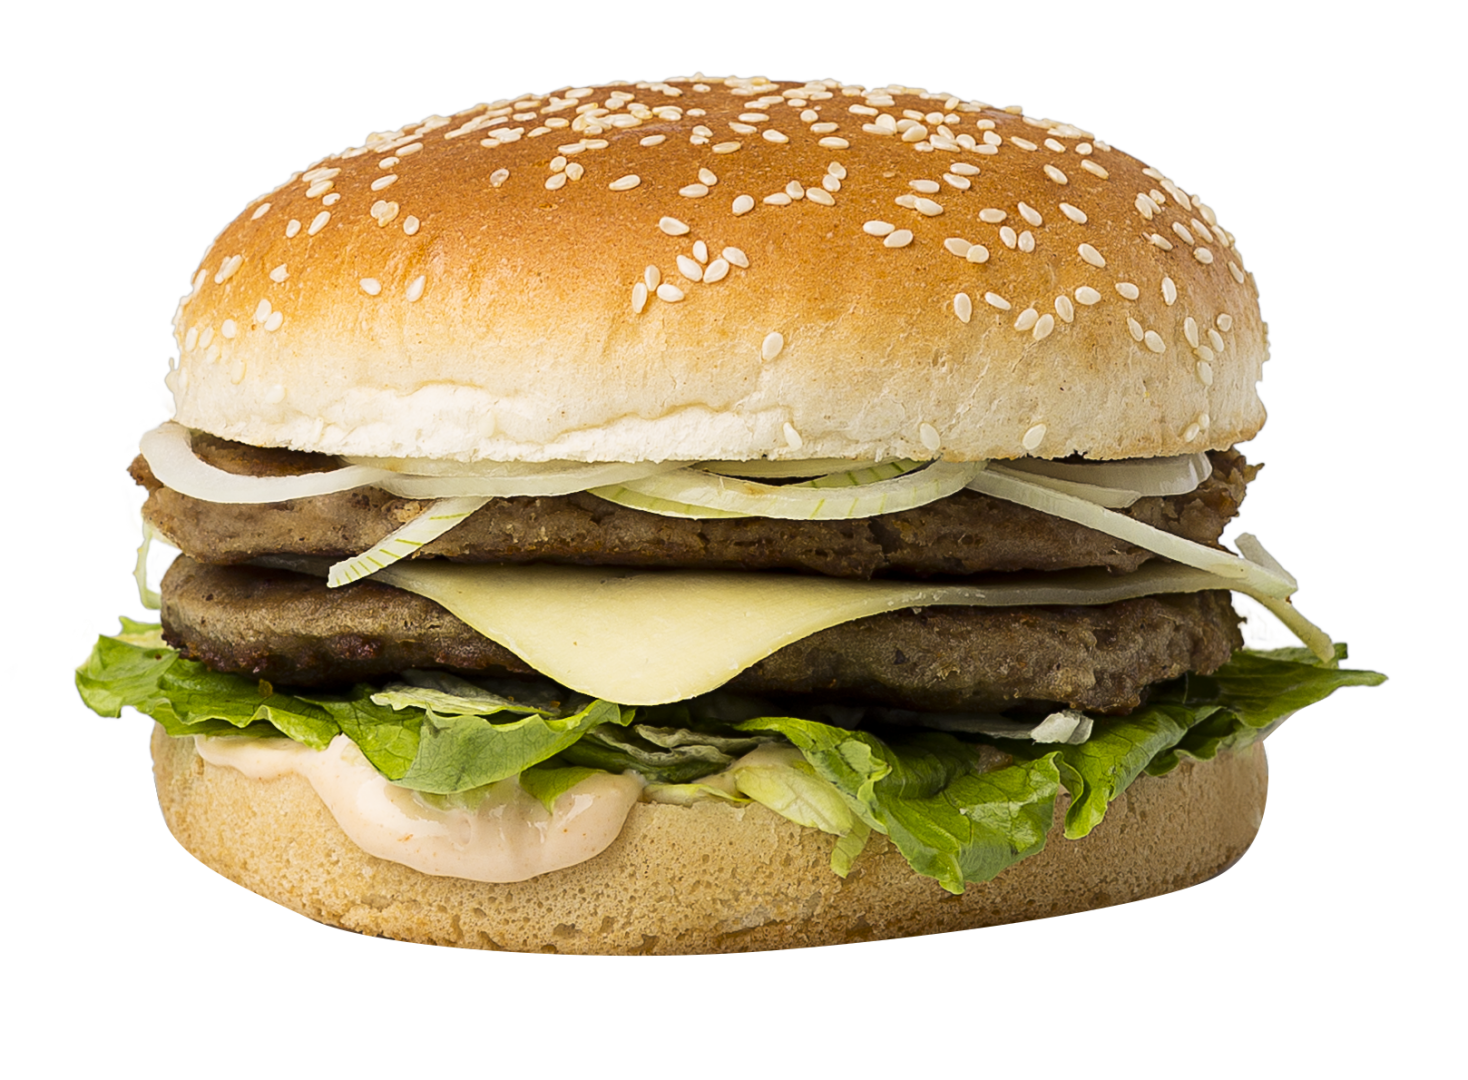 Dubbelburger